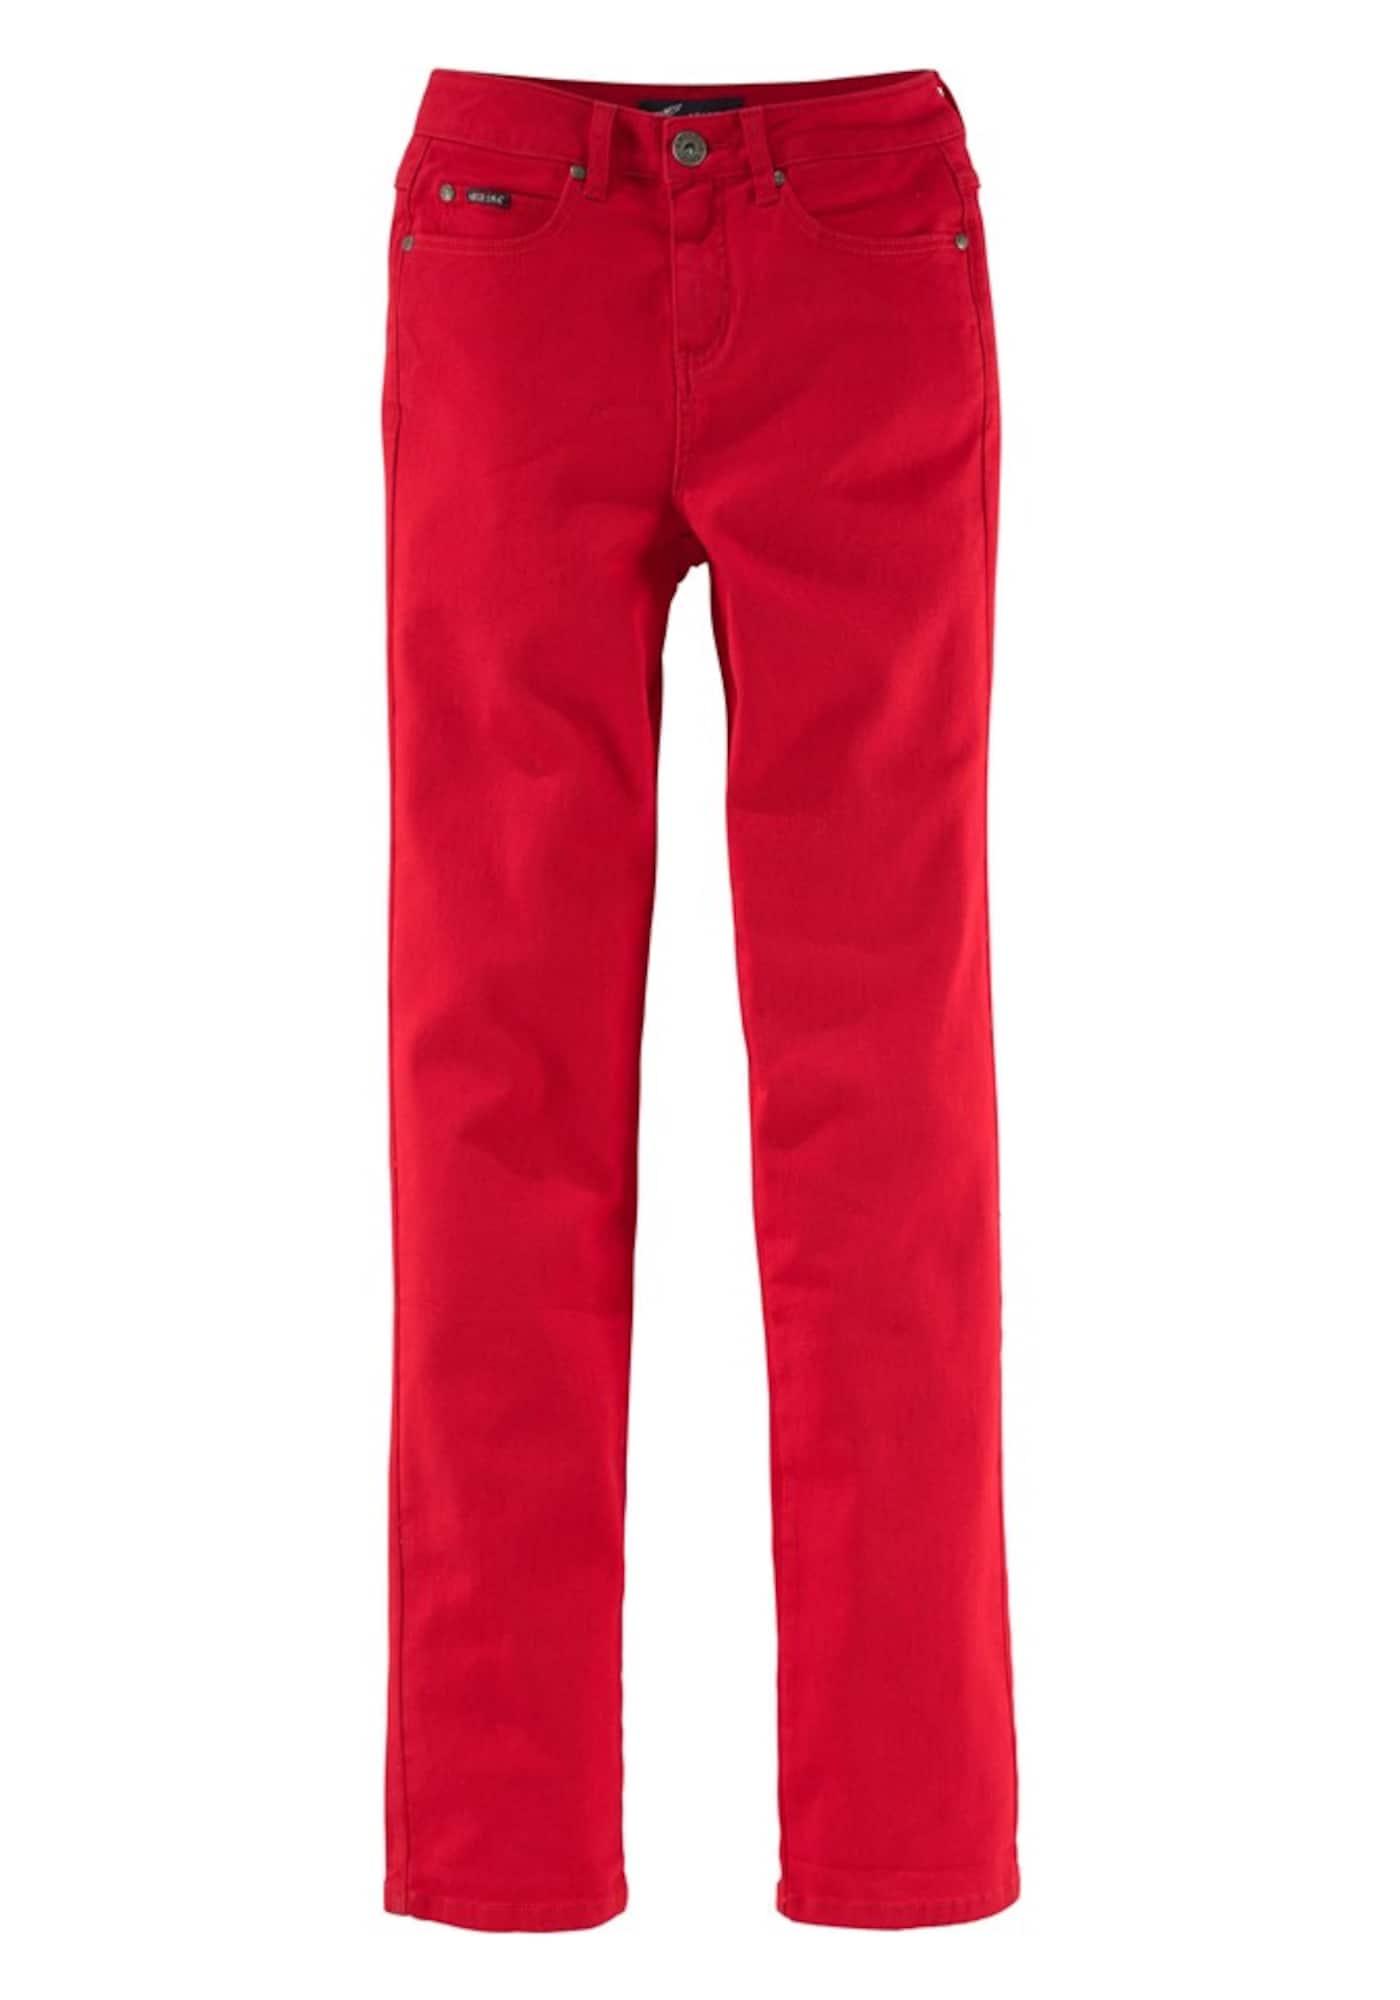 Bequeme Jeans 'Gerade Jeans mit klassicher Leibhöhe' | Bekleidung > Jeans > Gerade Jeans | ARIZONA